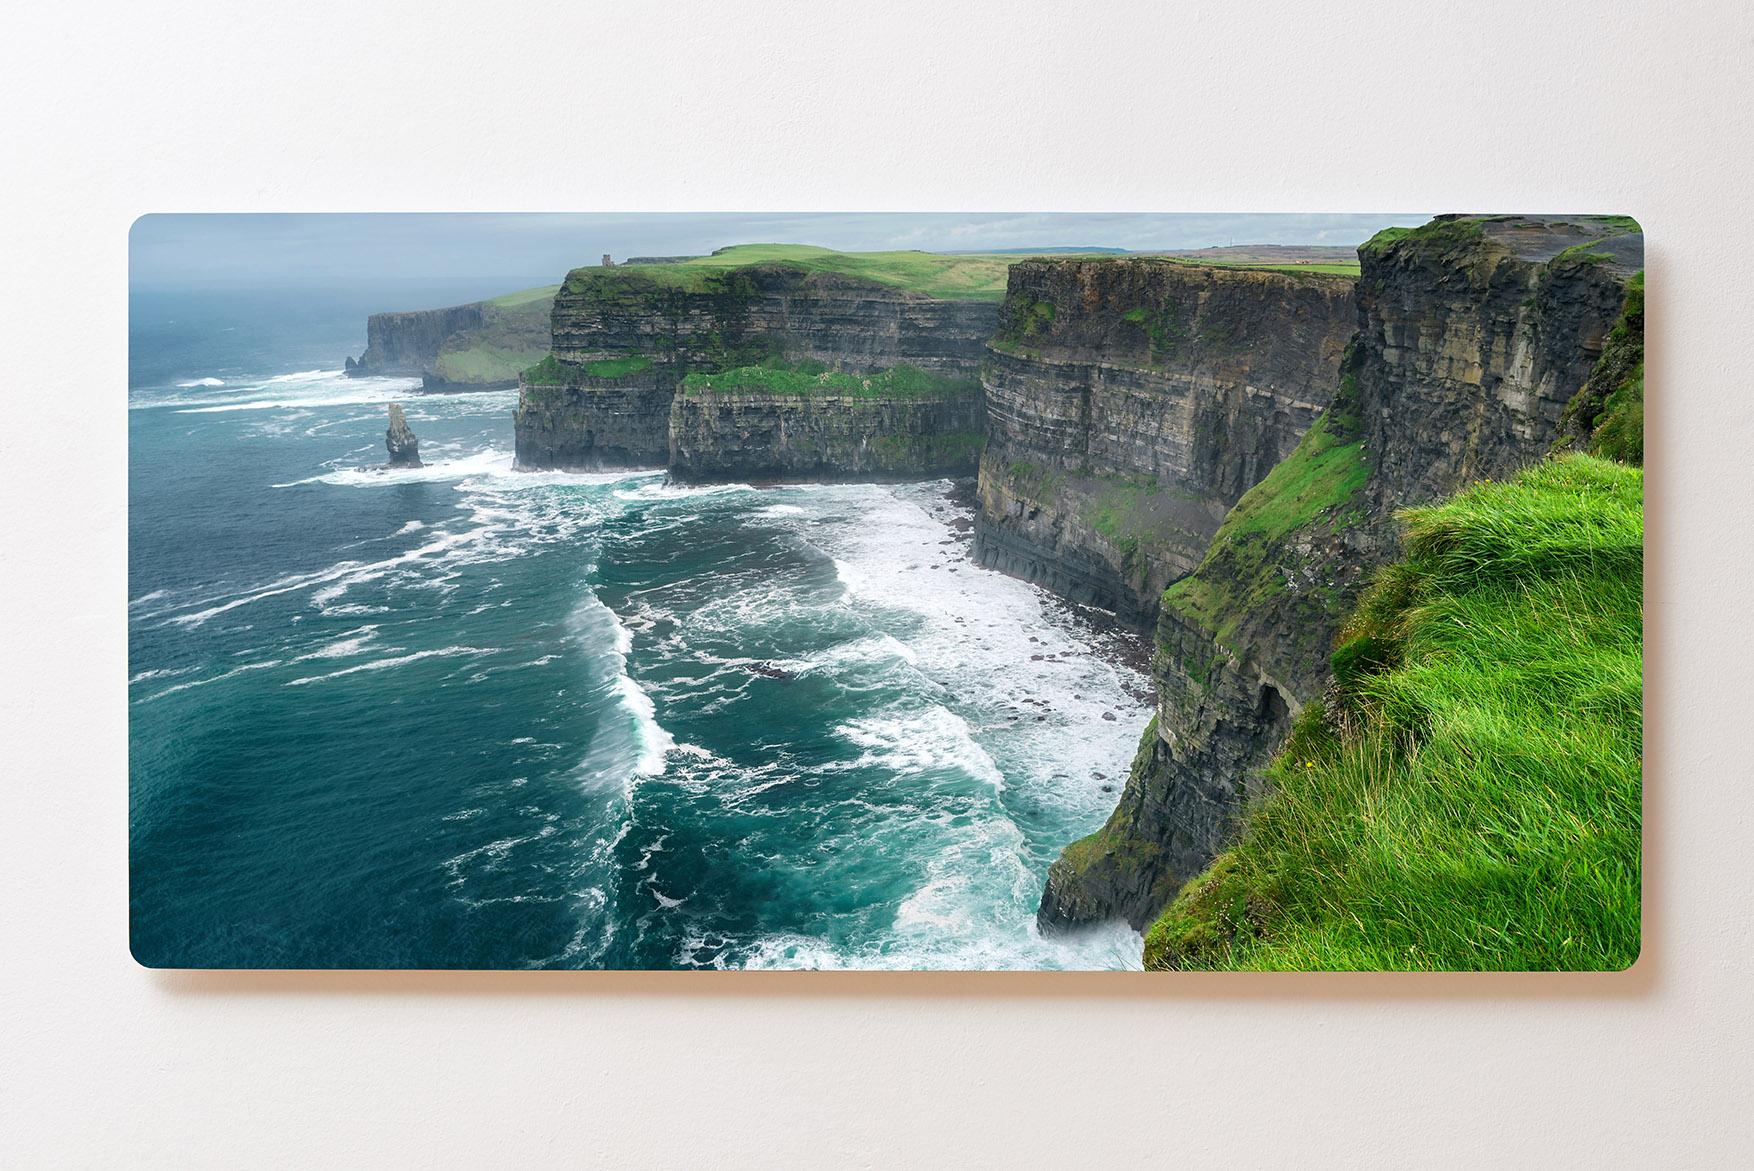 Magnettafel BACKLIGHT 120x60cm Motiv-Wandbild M145 Steinküste Meer